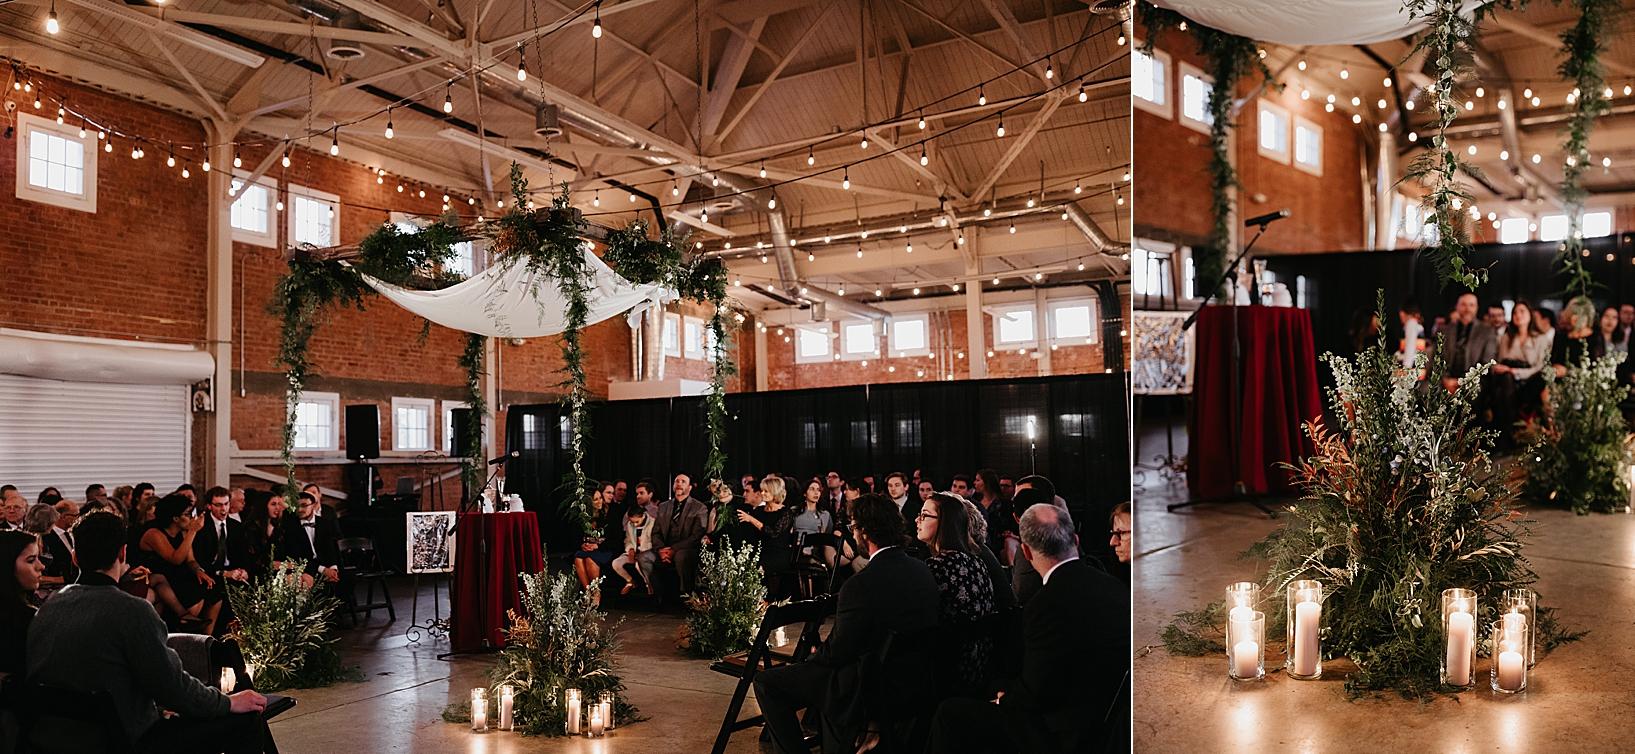 Brick-San-Diego-Winter-Wedding-47.jpg